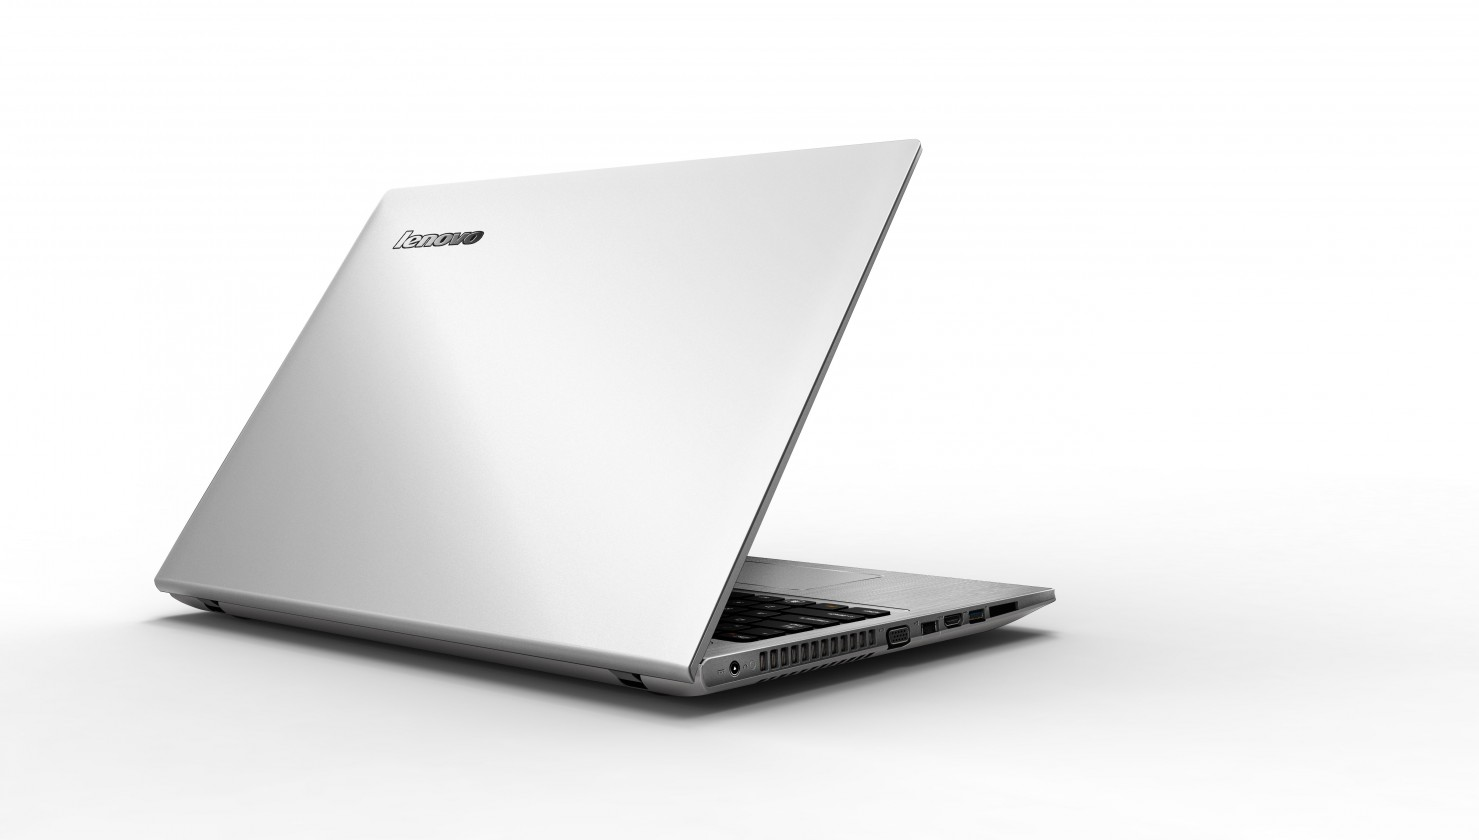 Lenovo IdeaPad Z500 bílá (59366579)